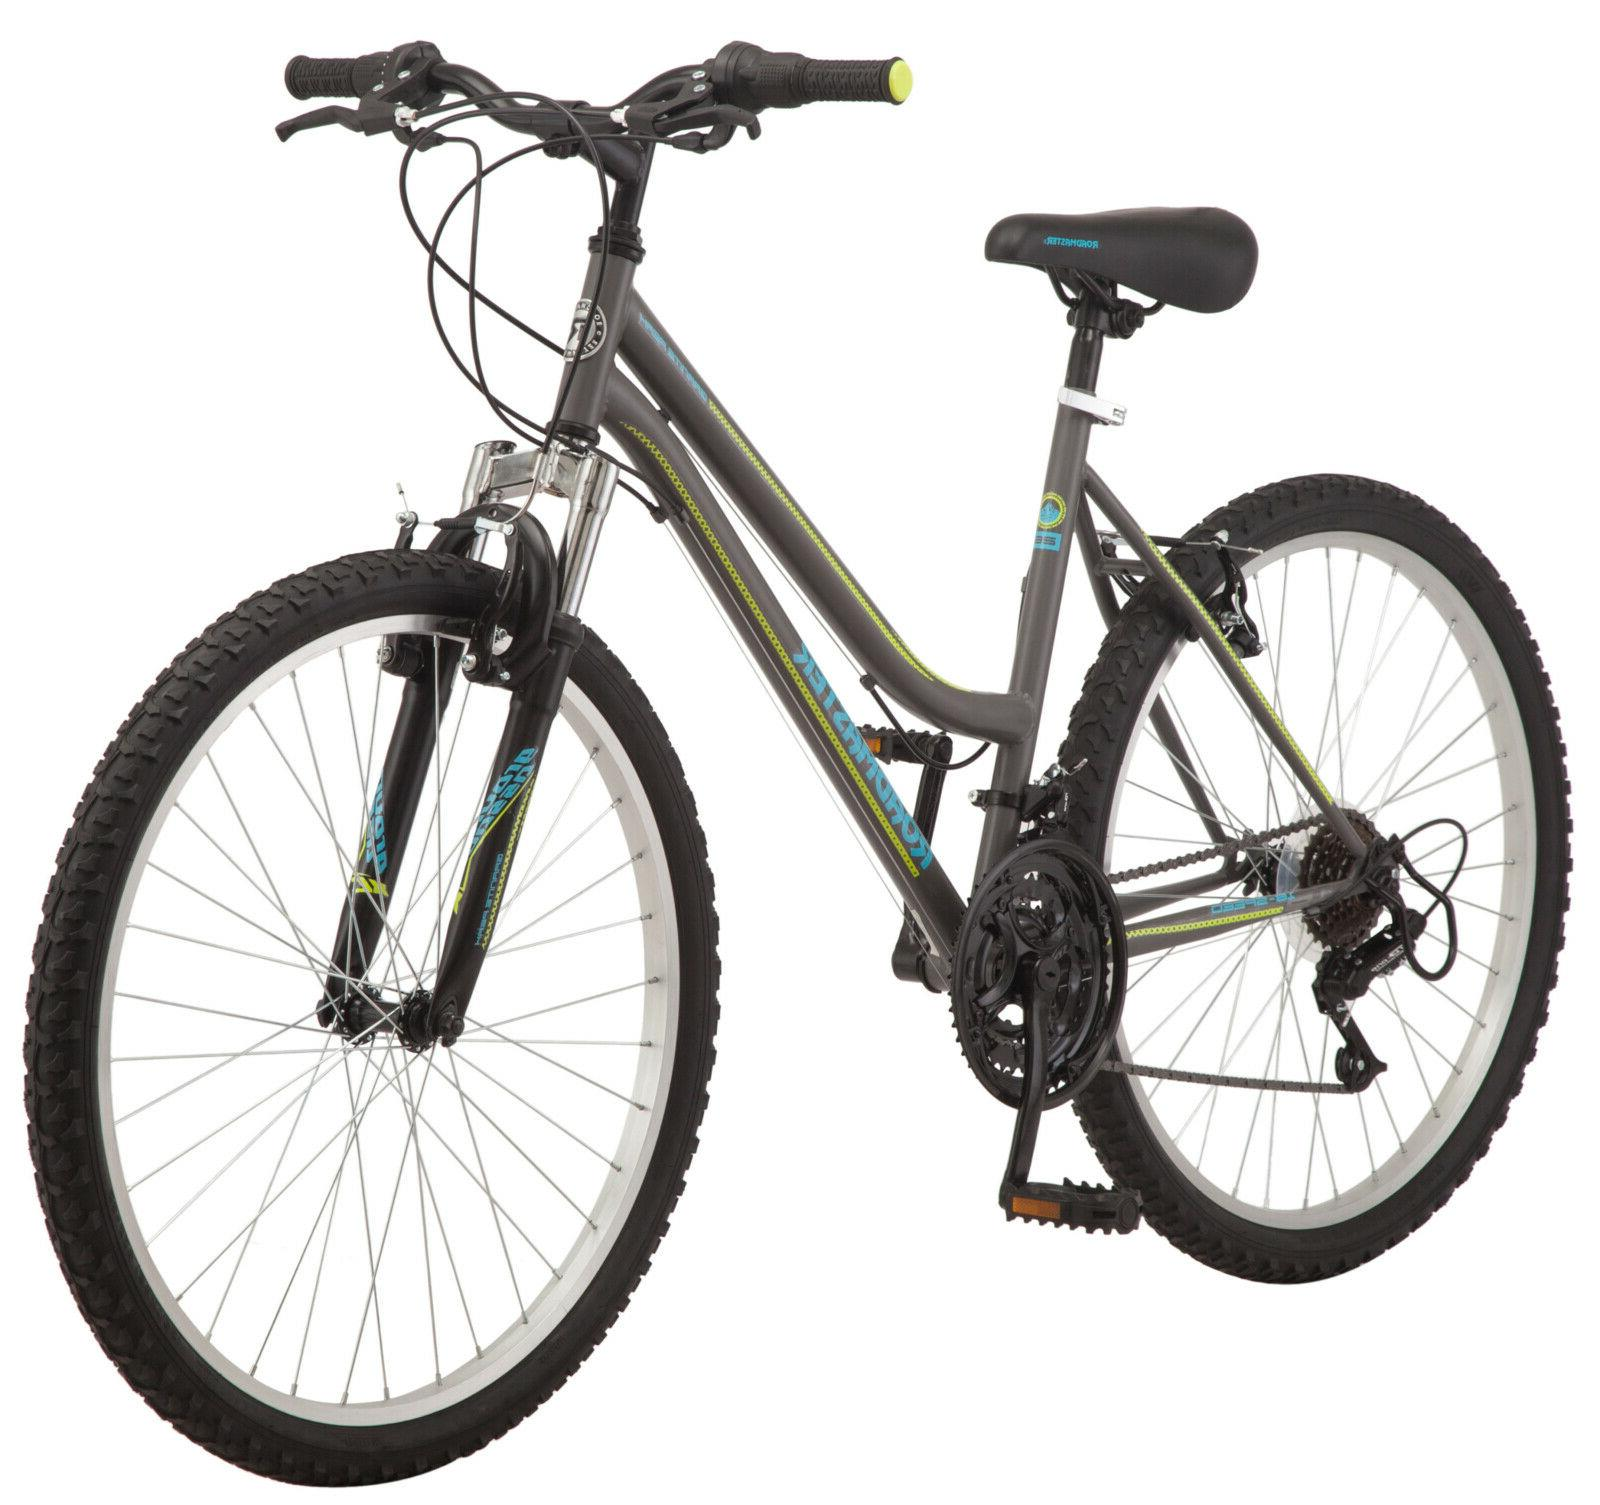 "Roadmaster Granite Peak Mountain Bike, 26"" Black"